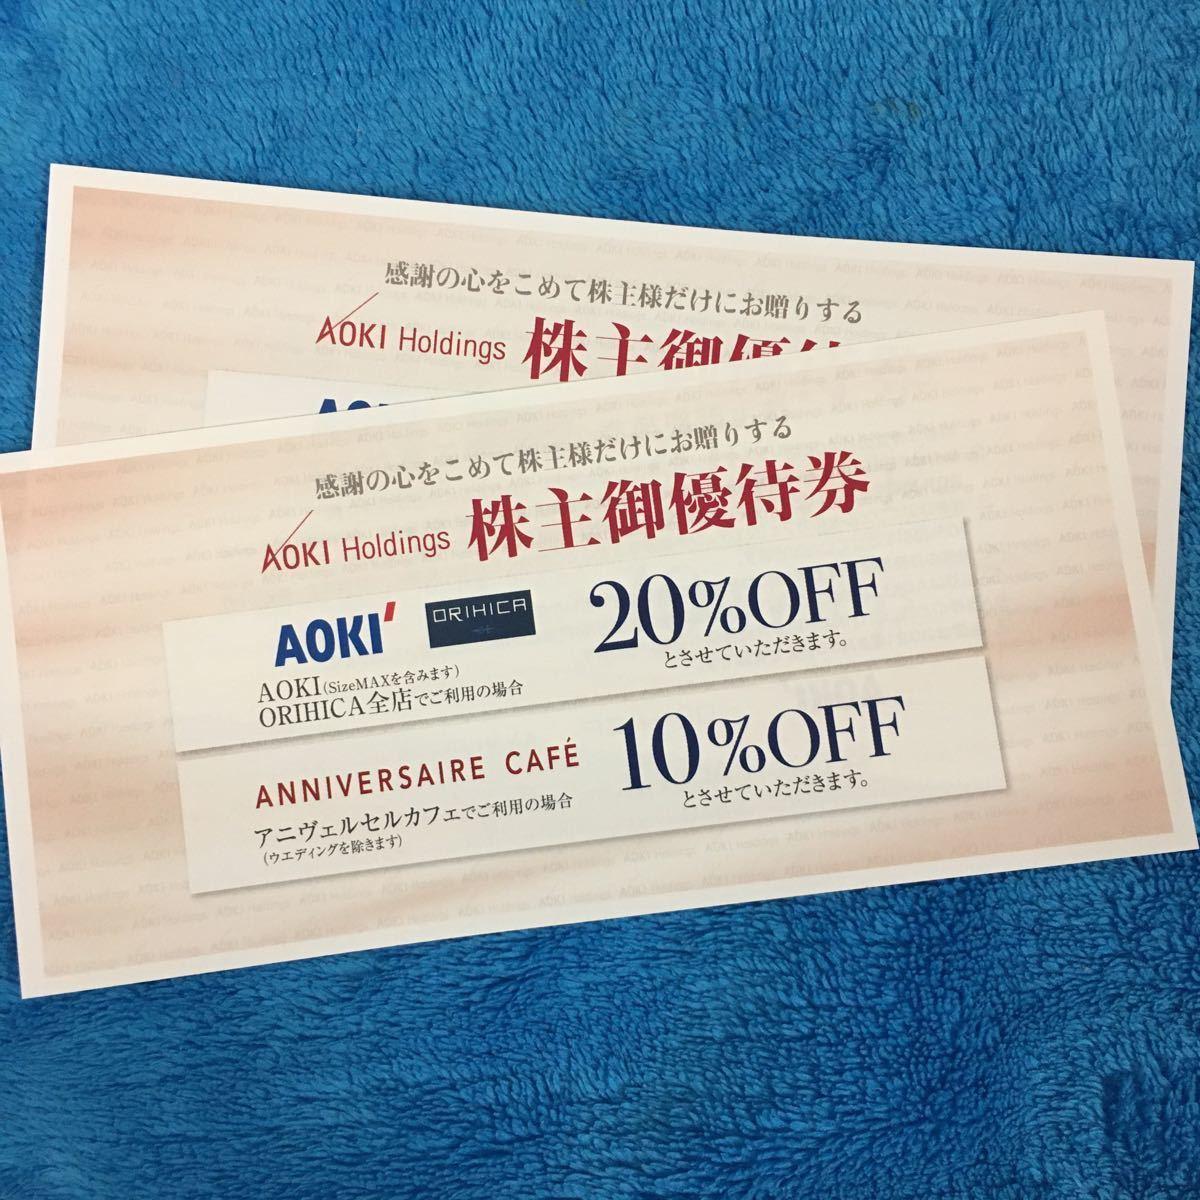 AOKI(アオキ)・ORIHICA株主優待券2枚セット 20%OFF ミニレター対応63円 アオキ・オリヒカ 2021 年9月 30 日まで 延長_画像1